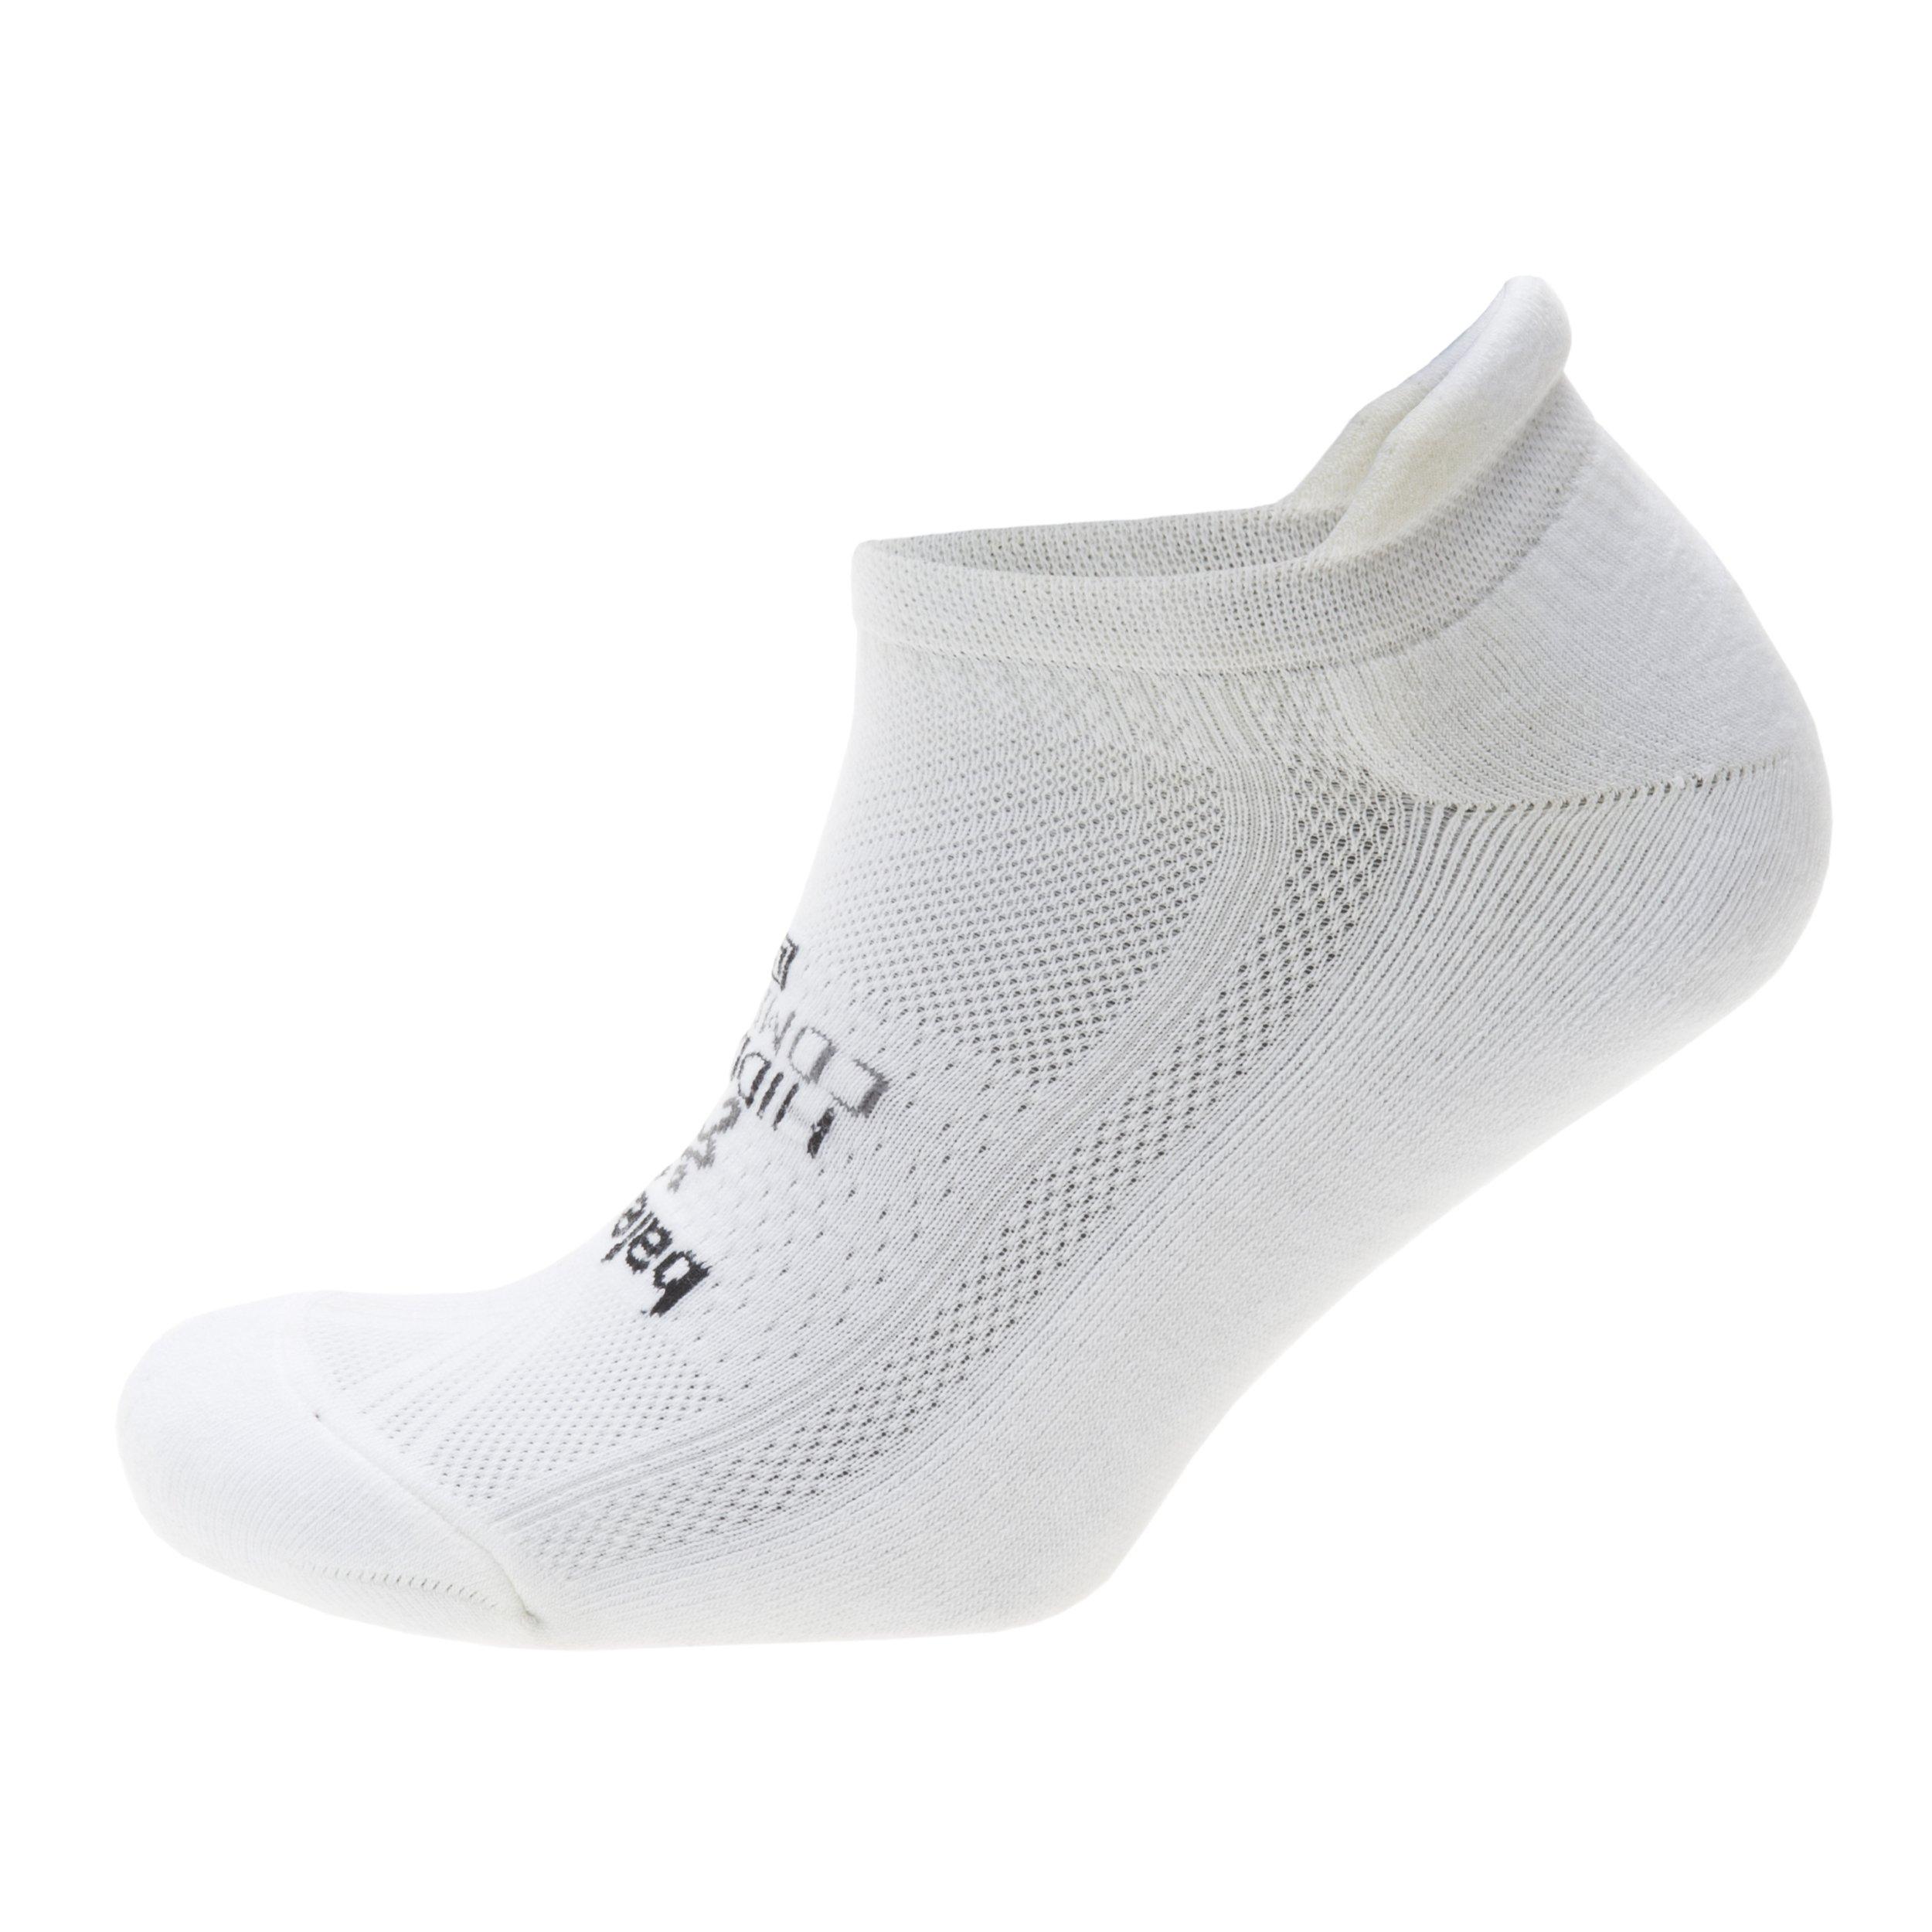 socks moisture comforter comfort nordstrom hidden fabric balega c wicking men s